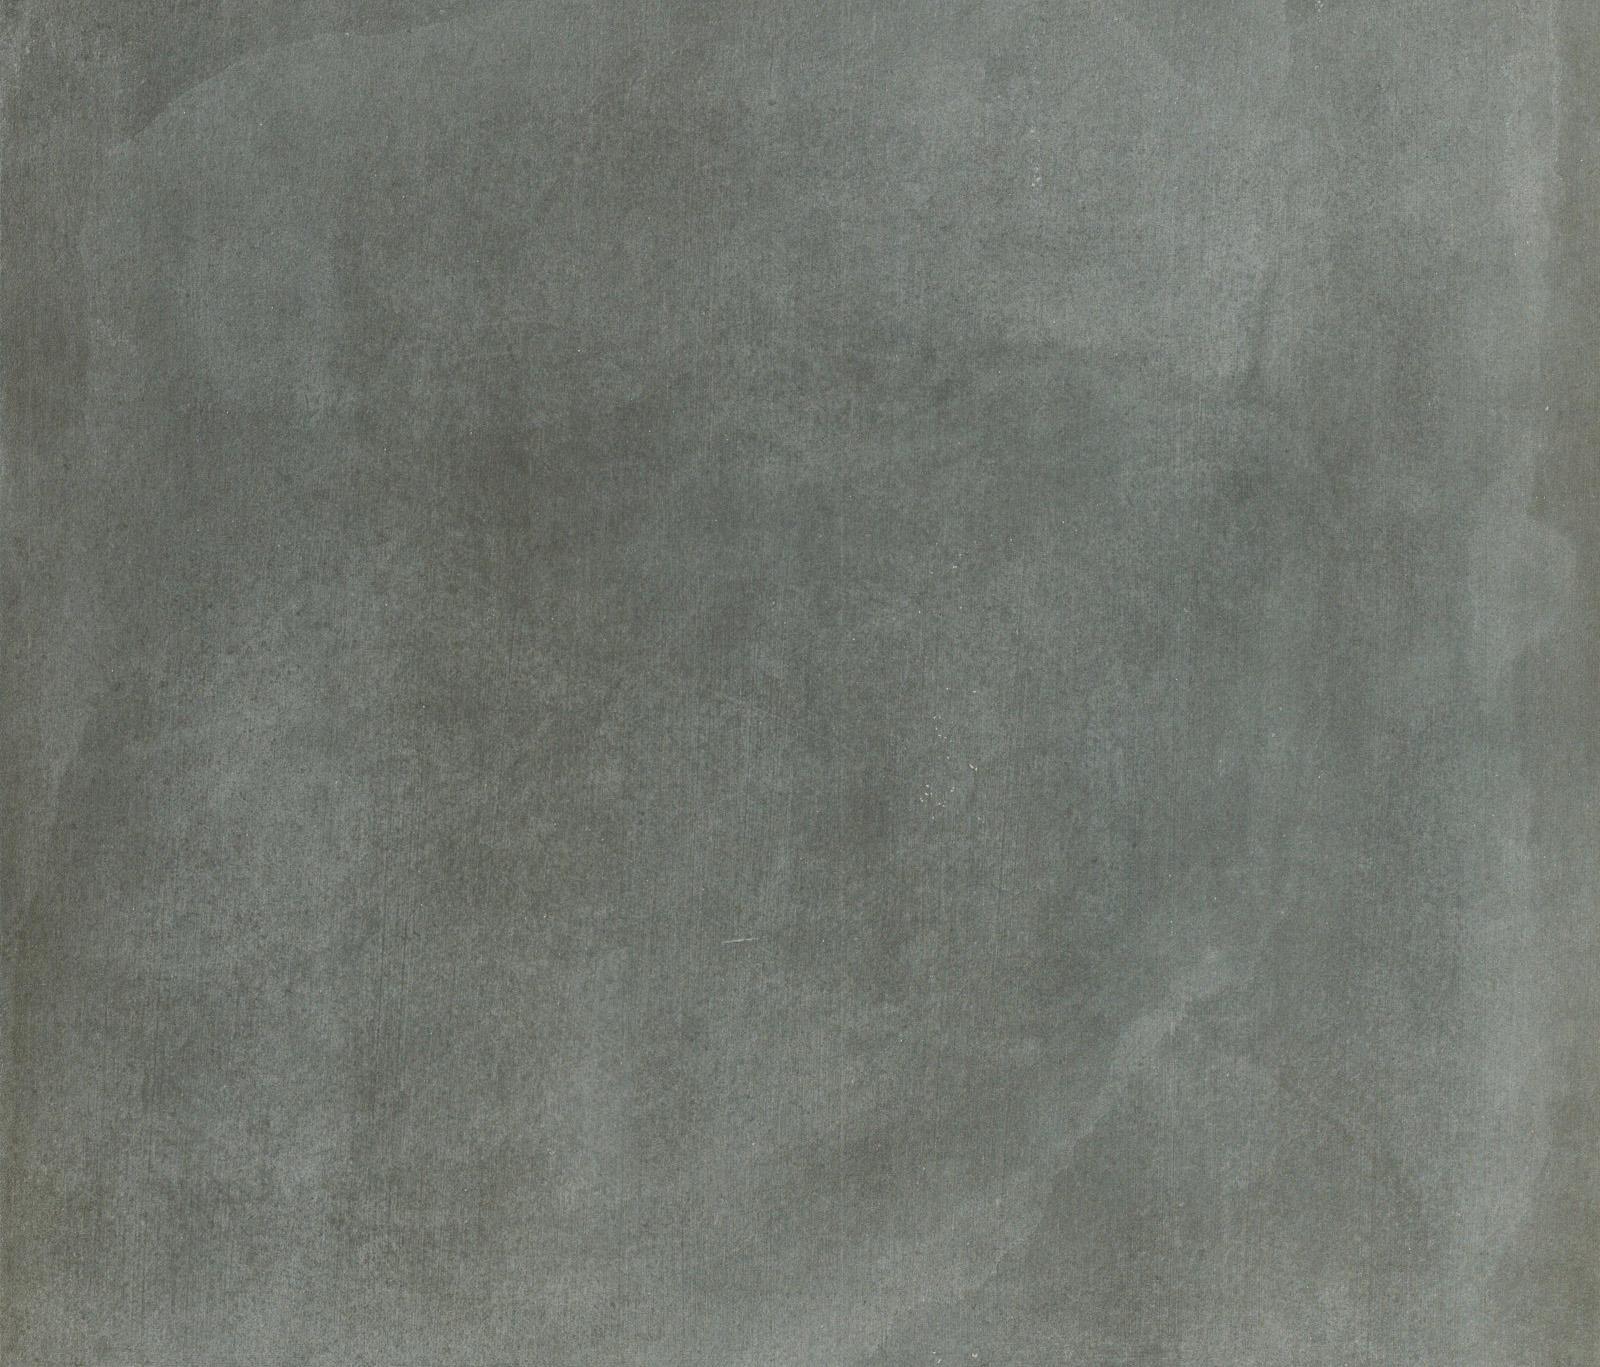 one indigo carrelage pour sol de caesar architonic. Black Bedroom Furniture Sets. Home Design Ideas